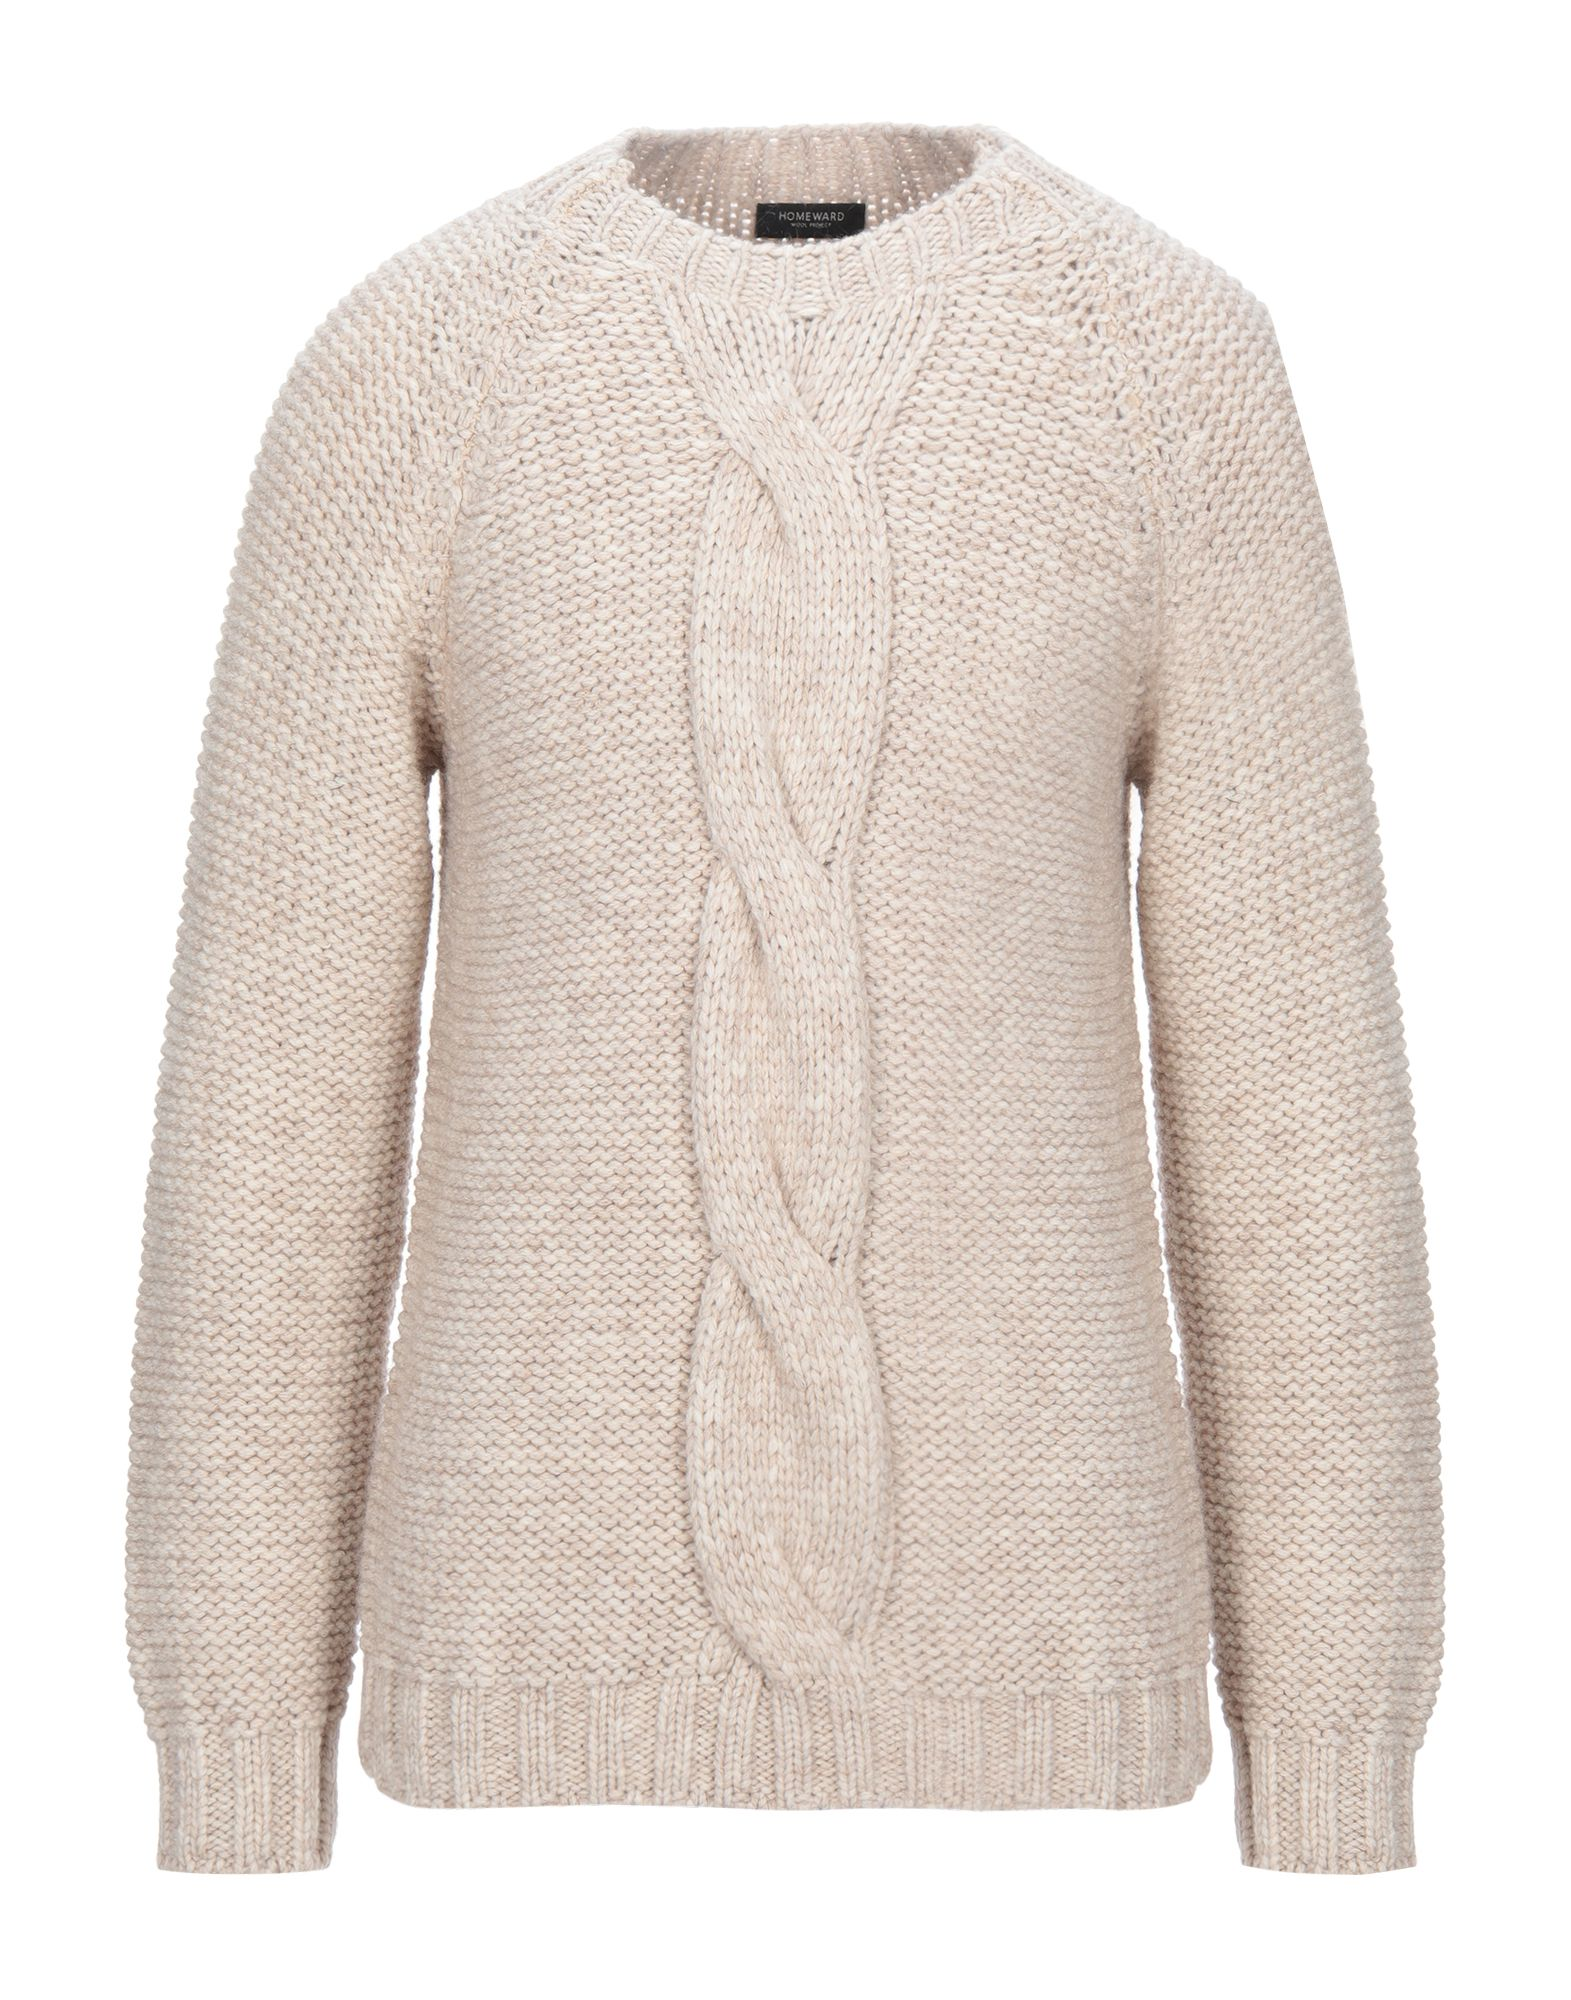 HOMEWARD CLOTHES Свитер homeward clothes кардиган